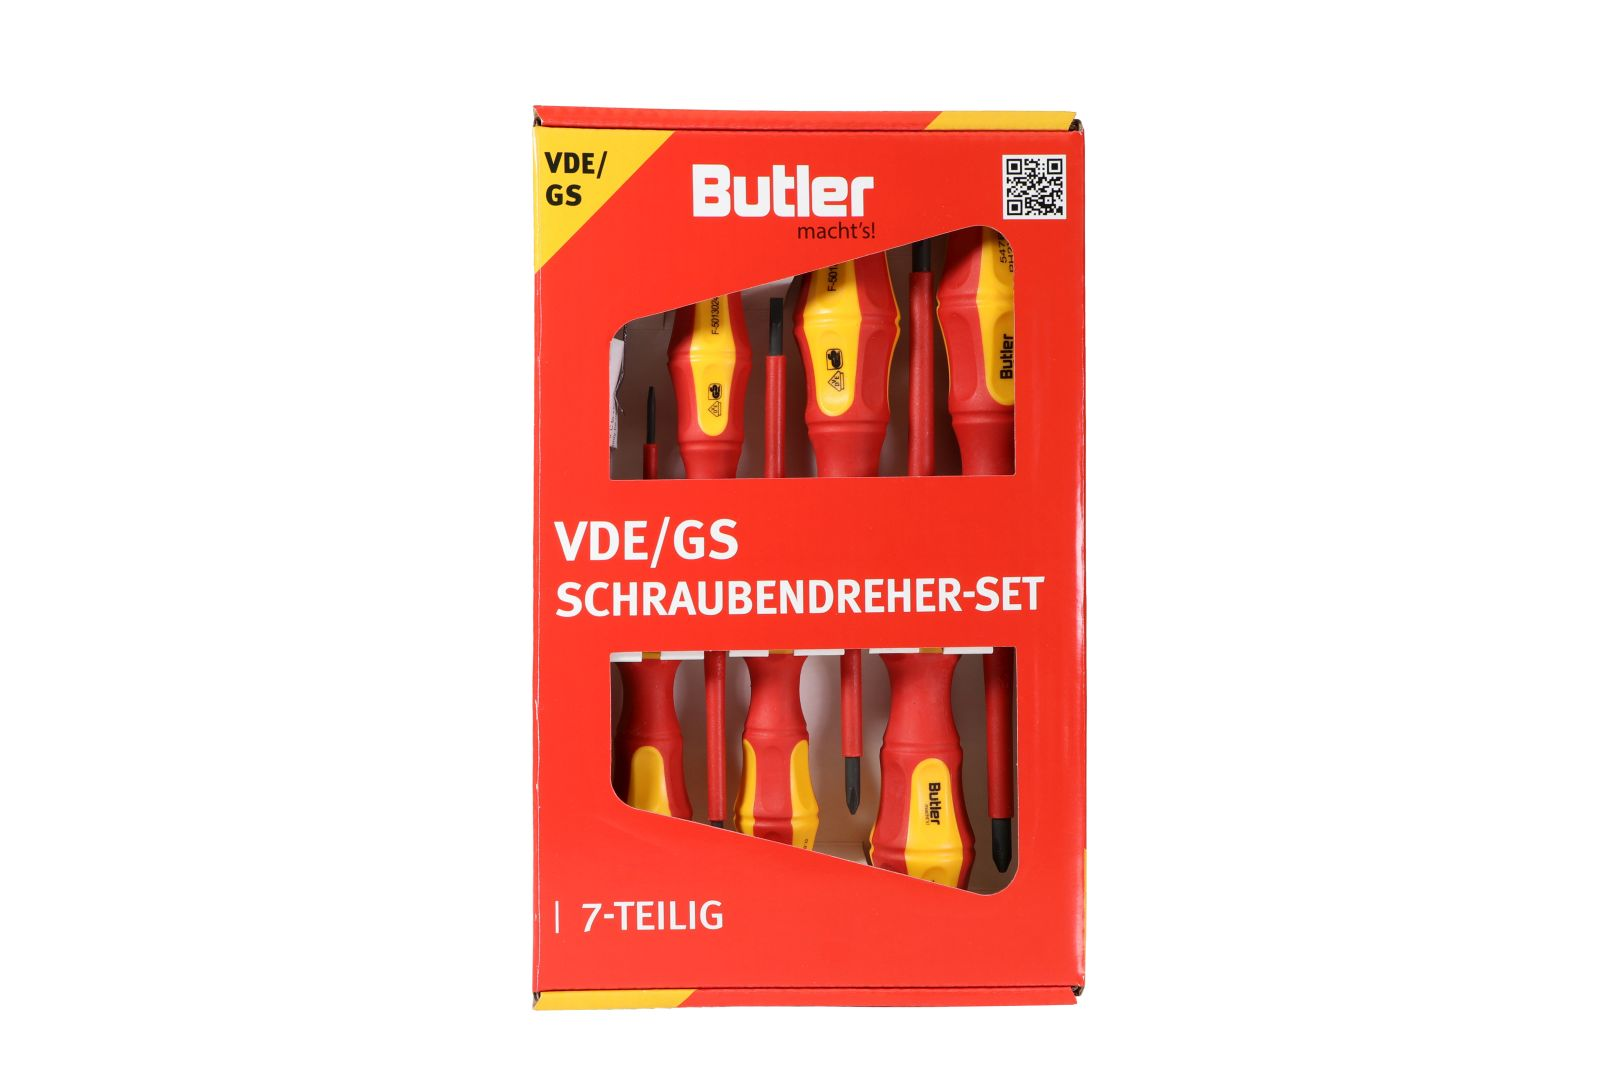 Butler macht's! VDE/GS Schraubendreher-Set, 7-teilig